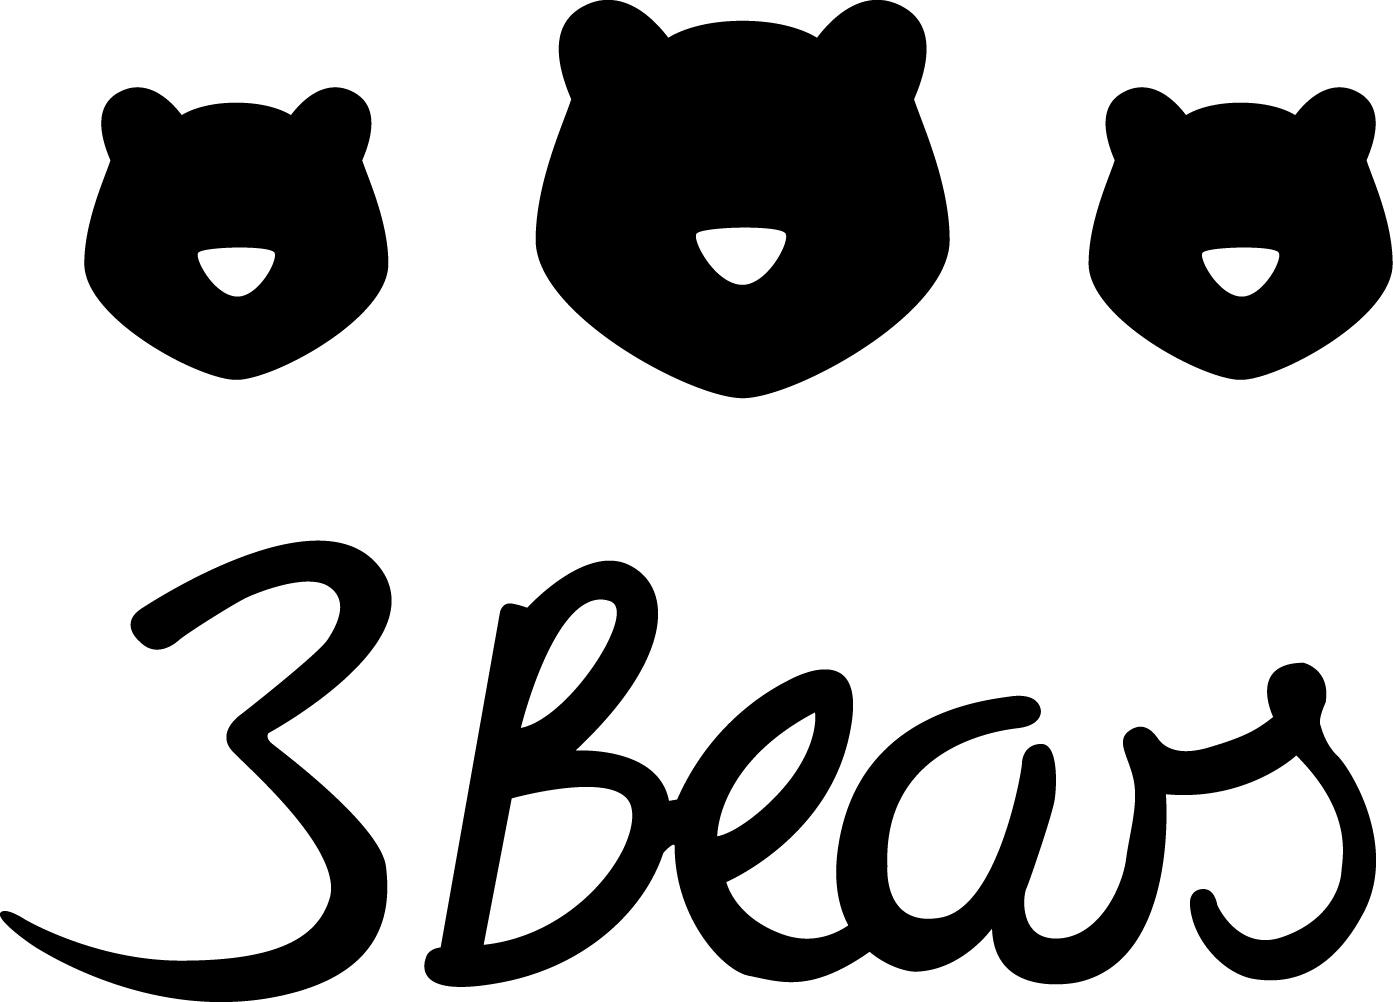 3Bears GmbH